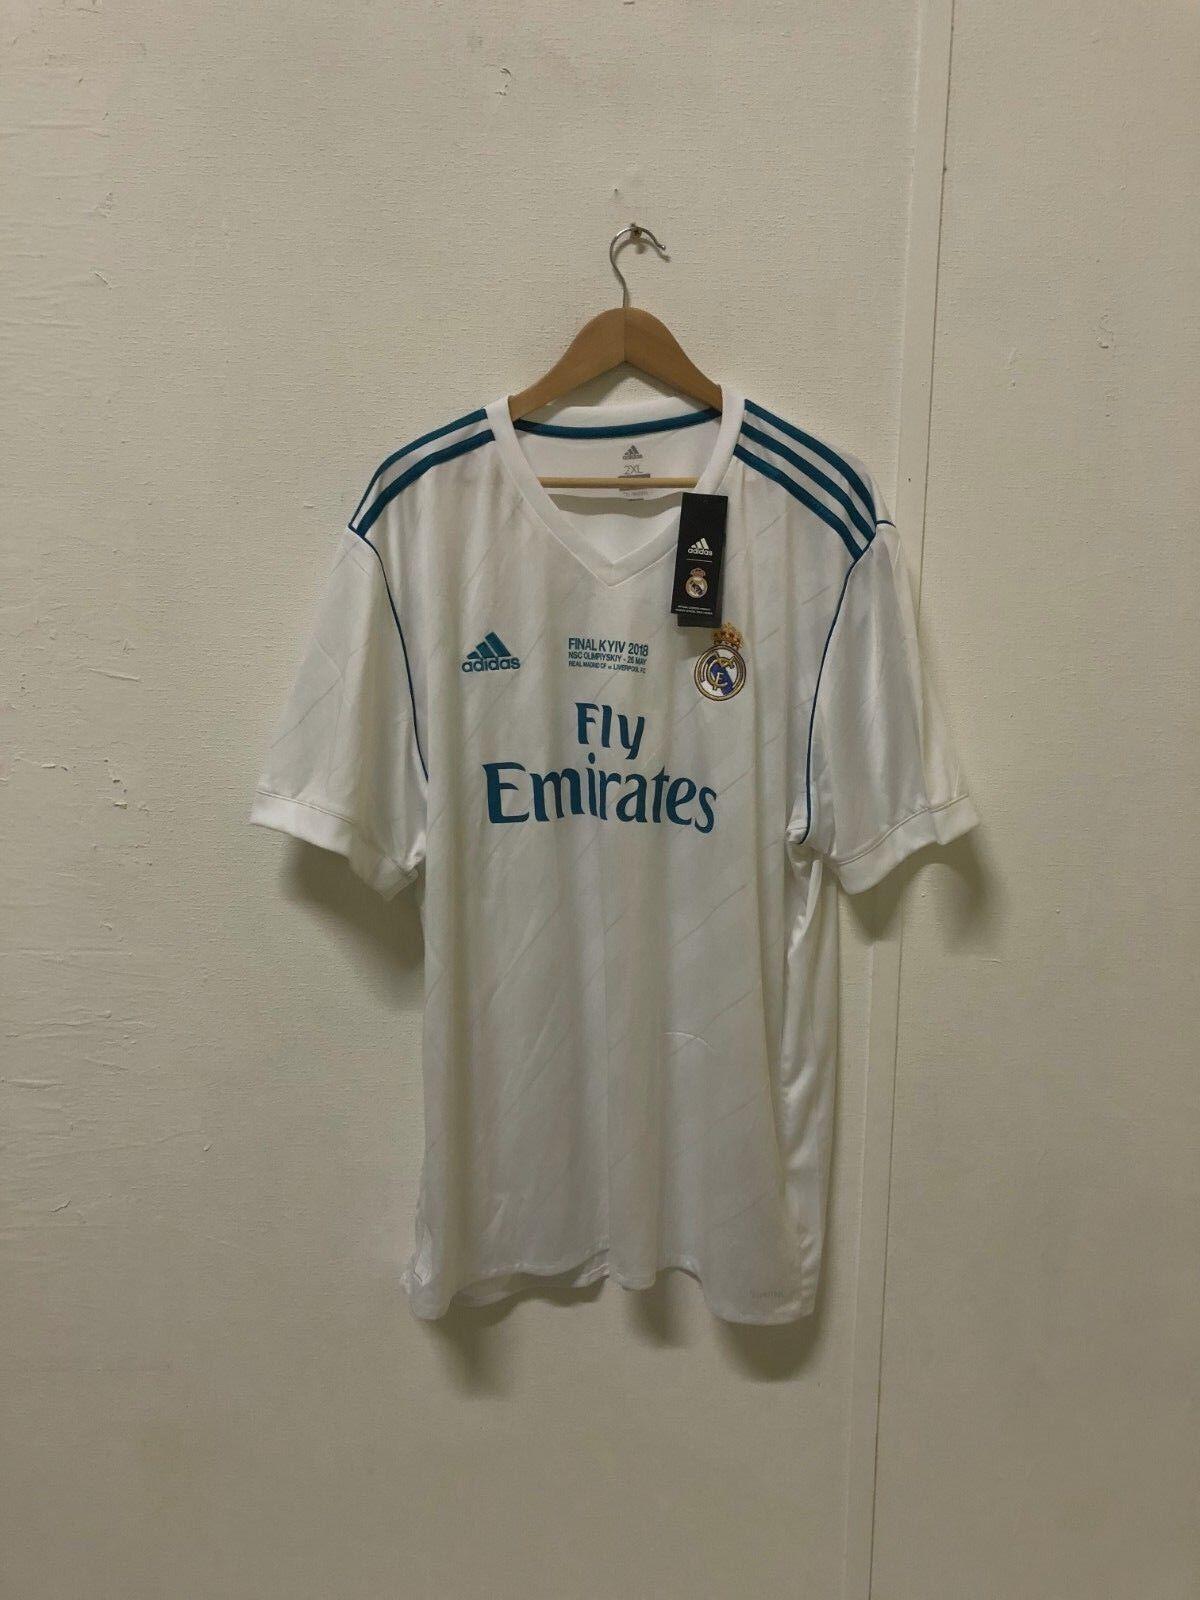 Adidas Men's Real Madrid 2017 18 CL Final Home Shirt - 2XL - No Name - New